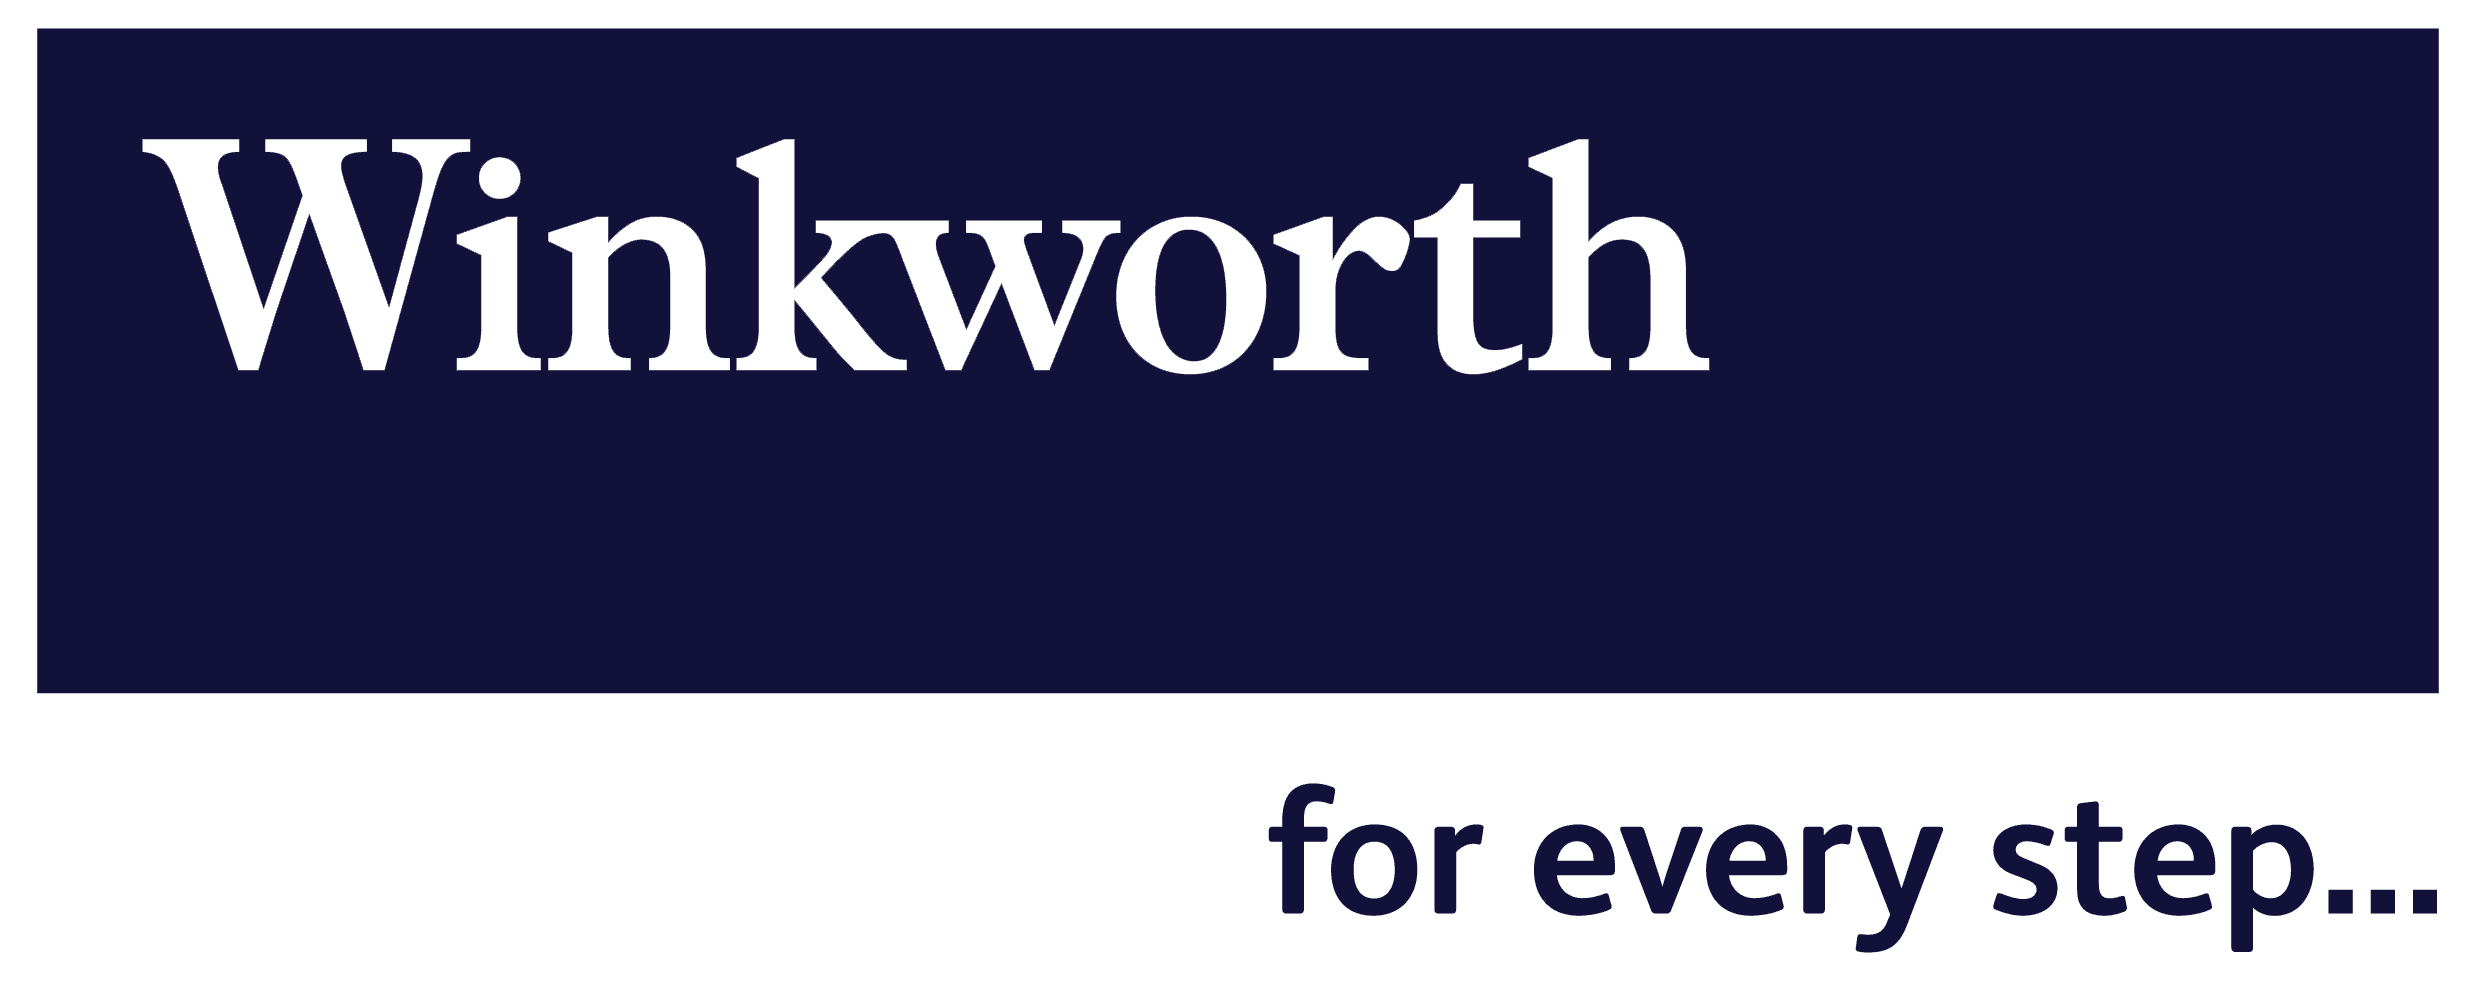 Winkworth-01